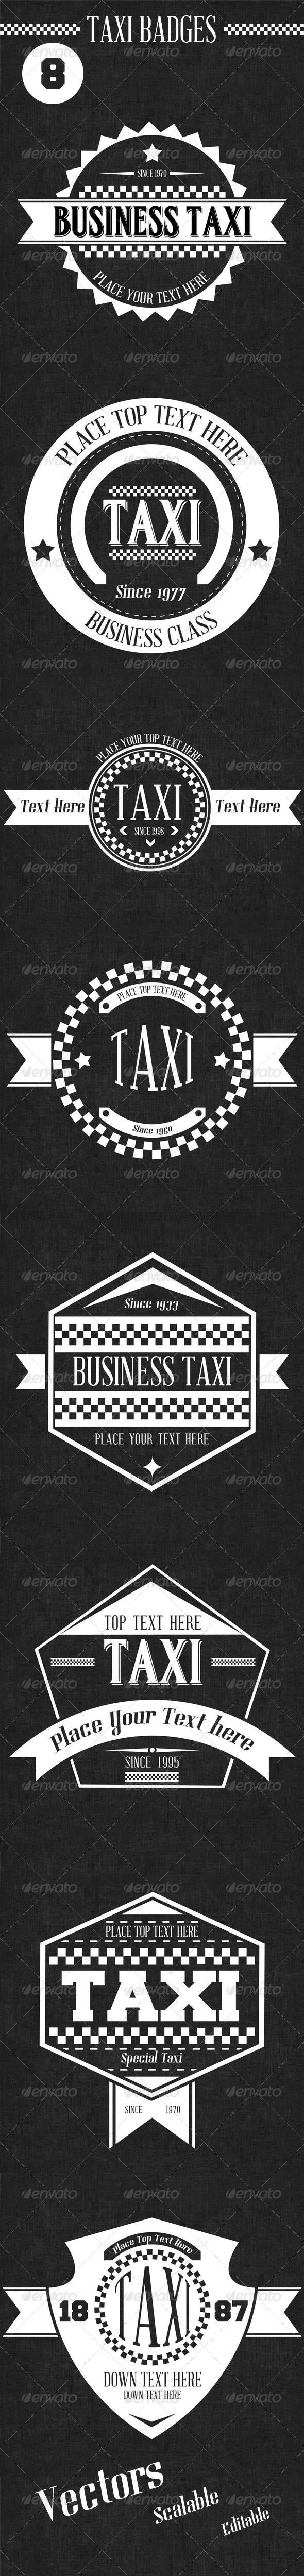 8 Retro Taxi Badges